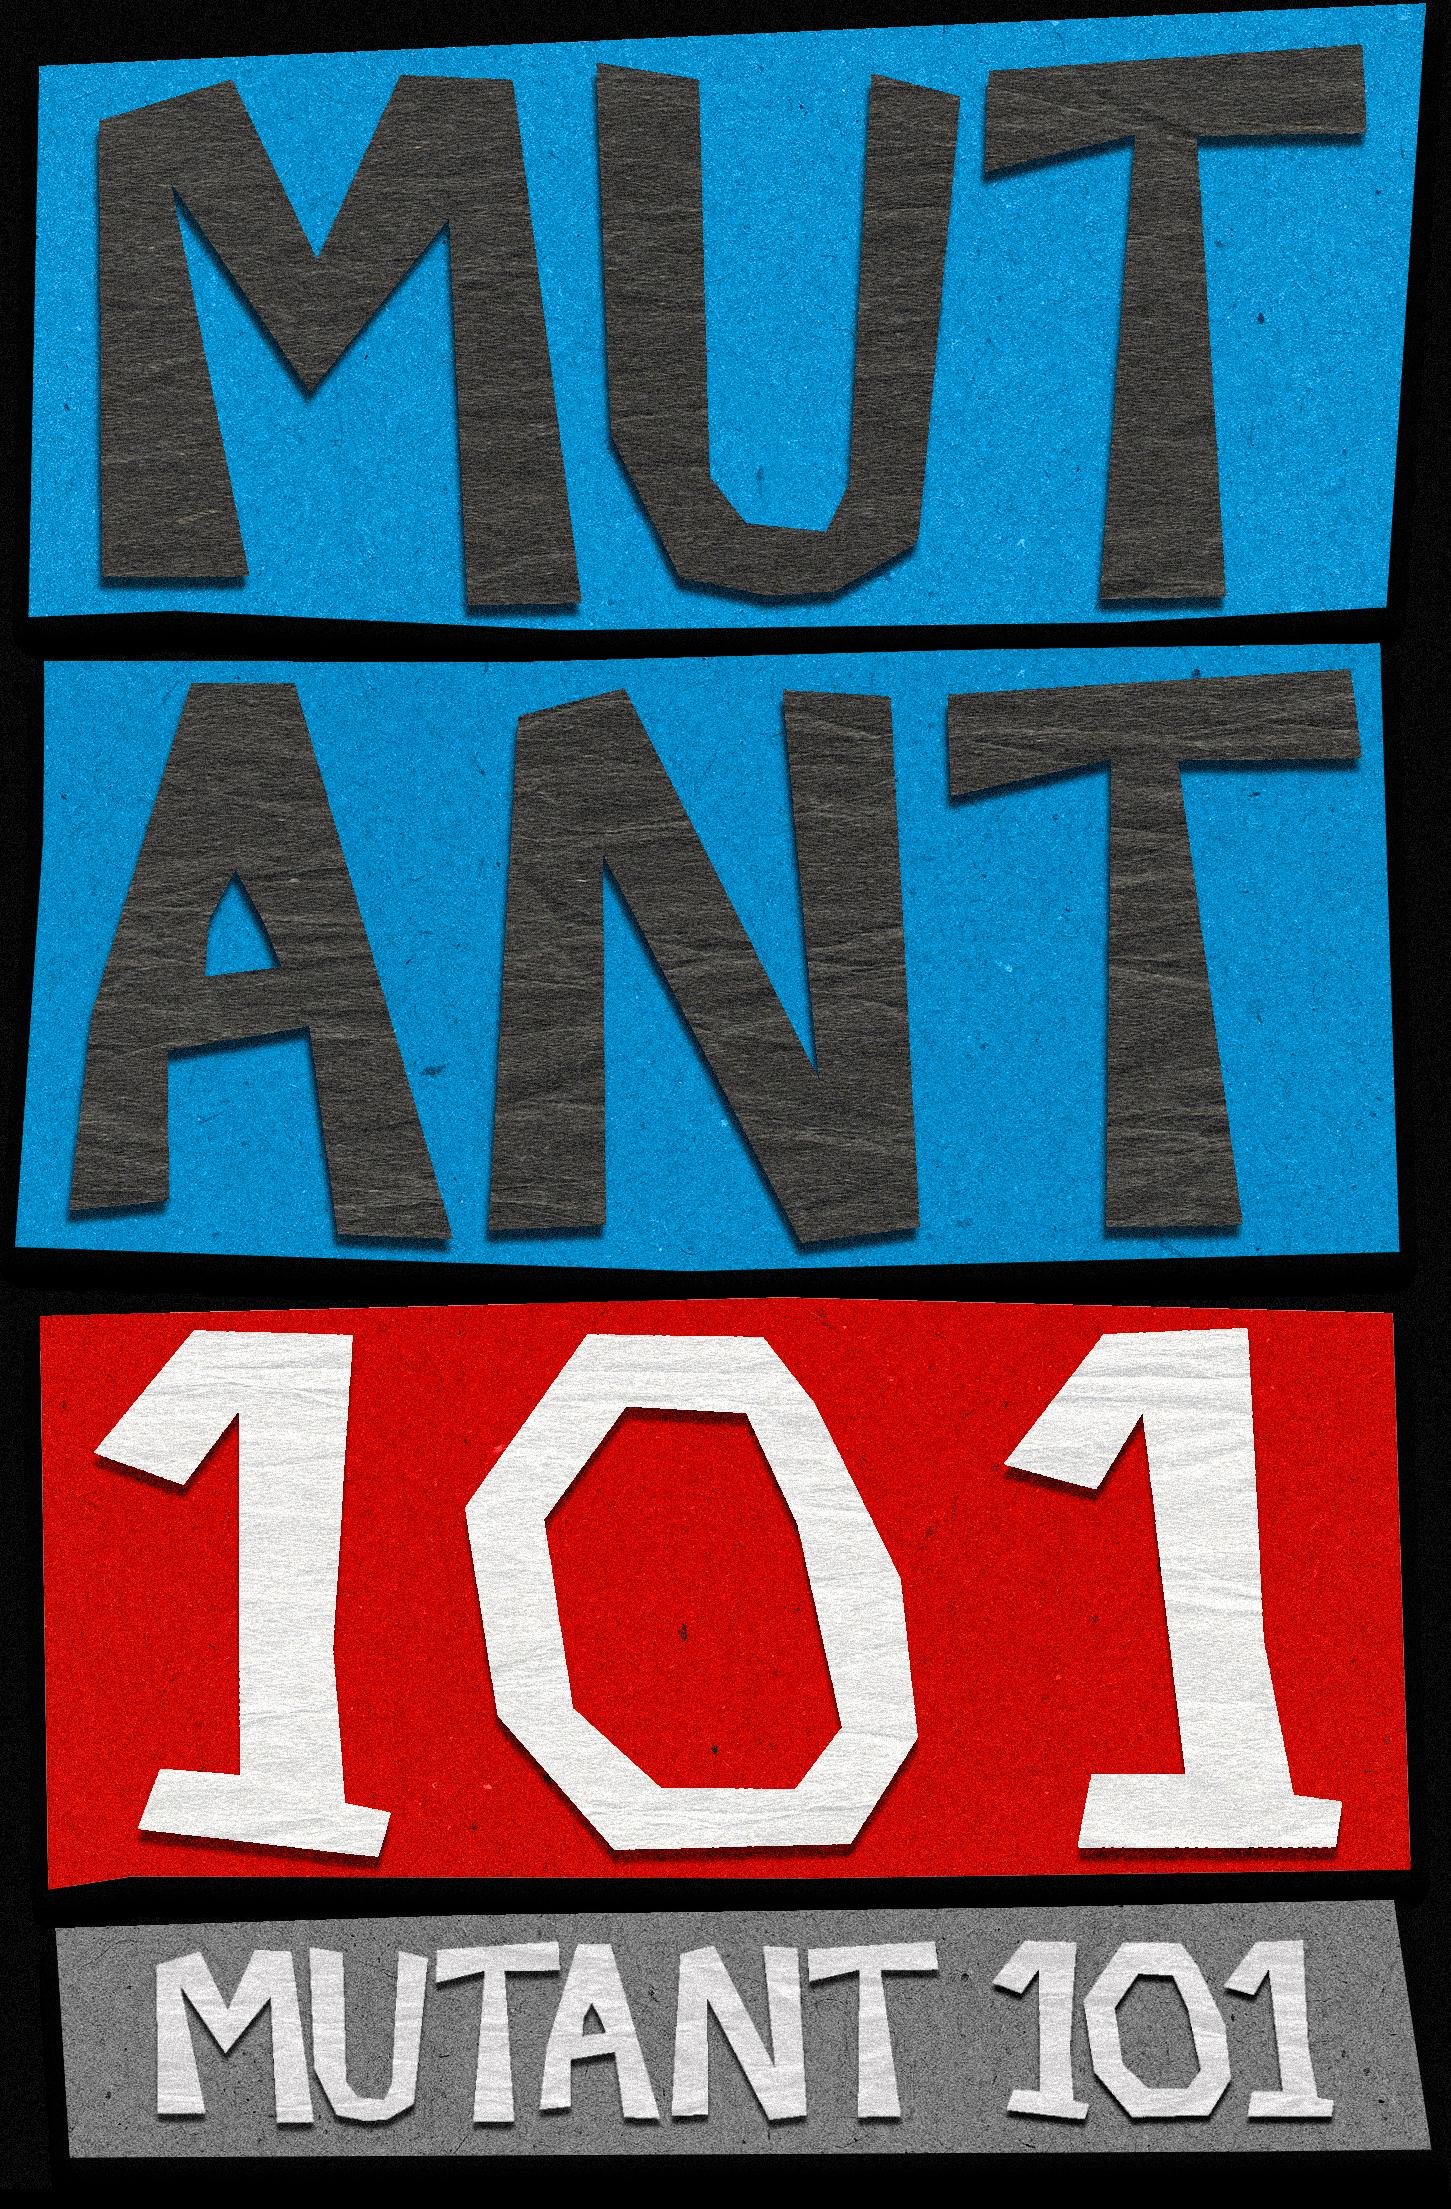 Mutant 101